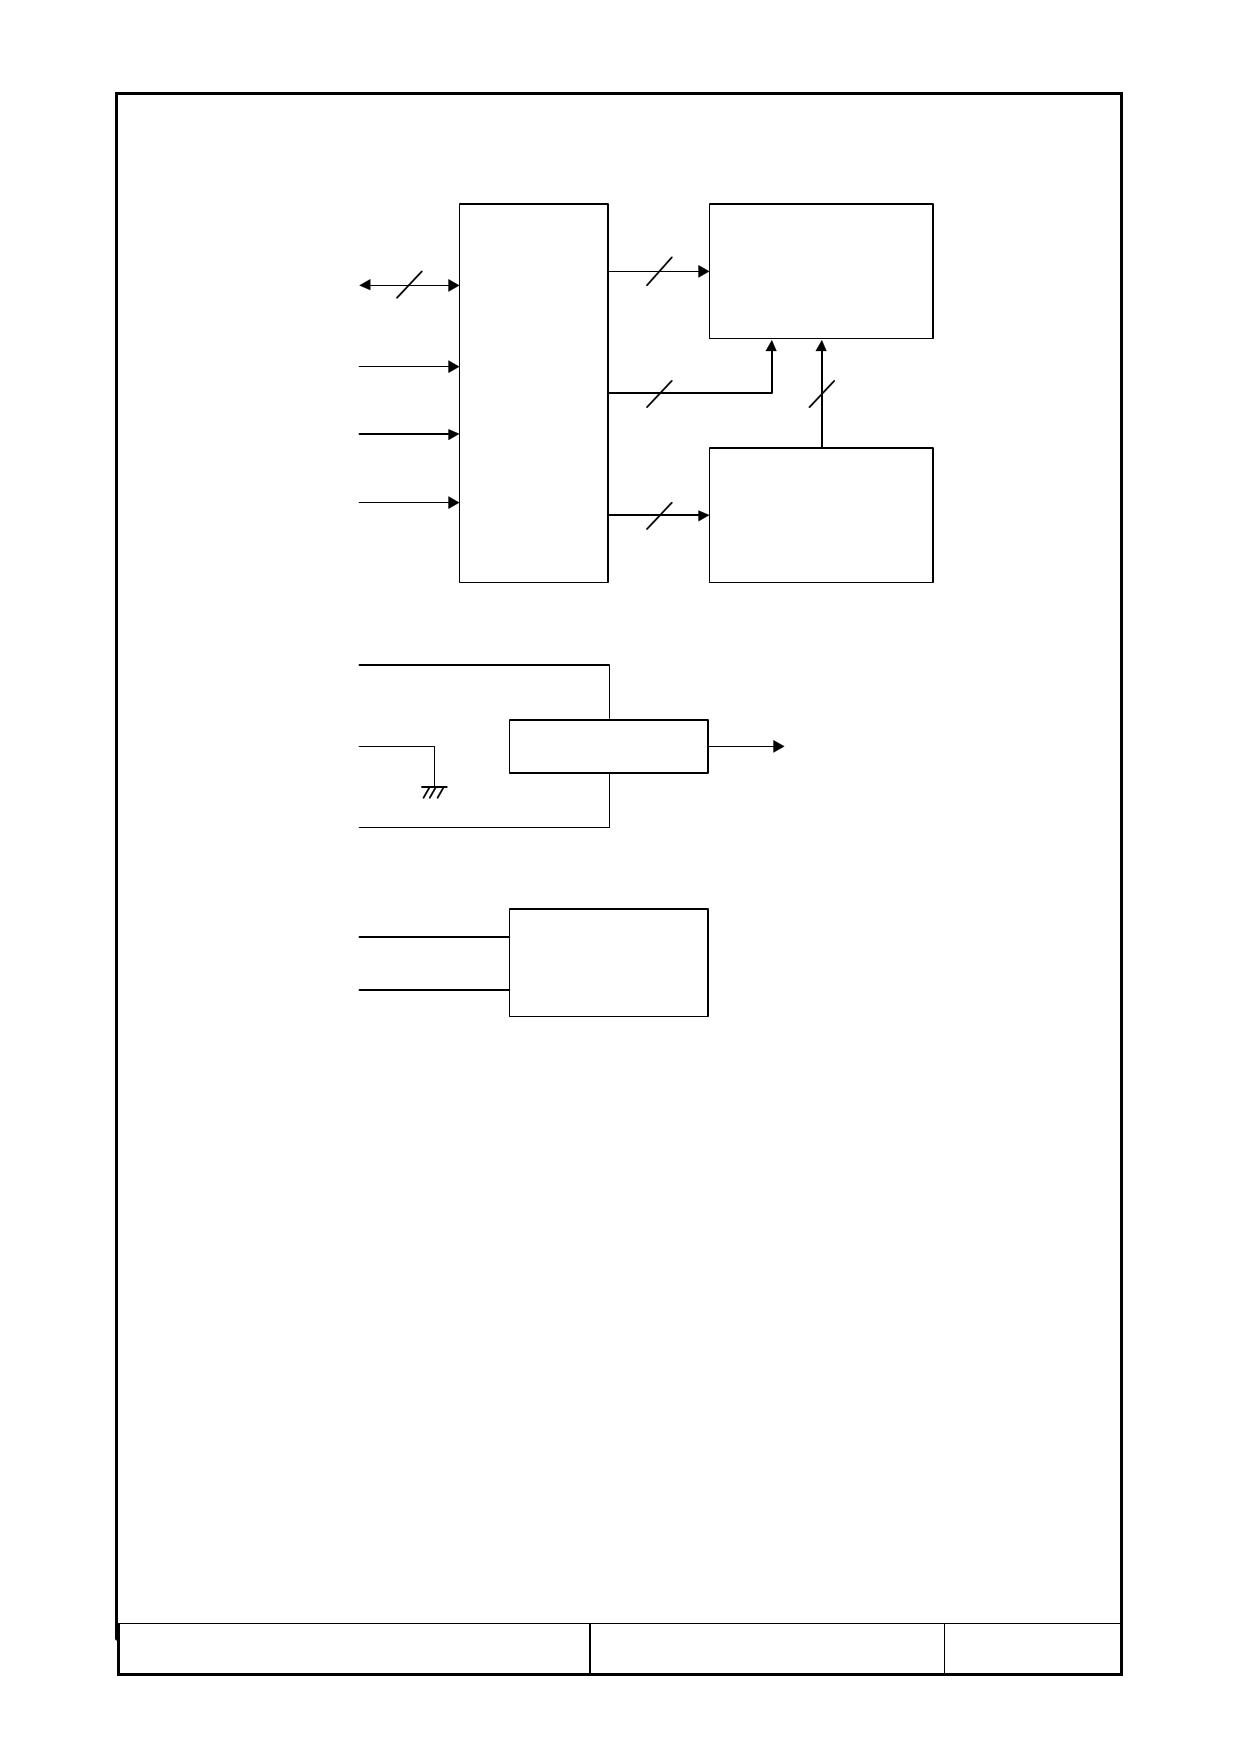 C-51847NFQJ-LG-ACN arduino